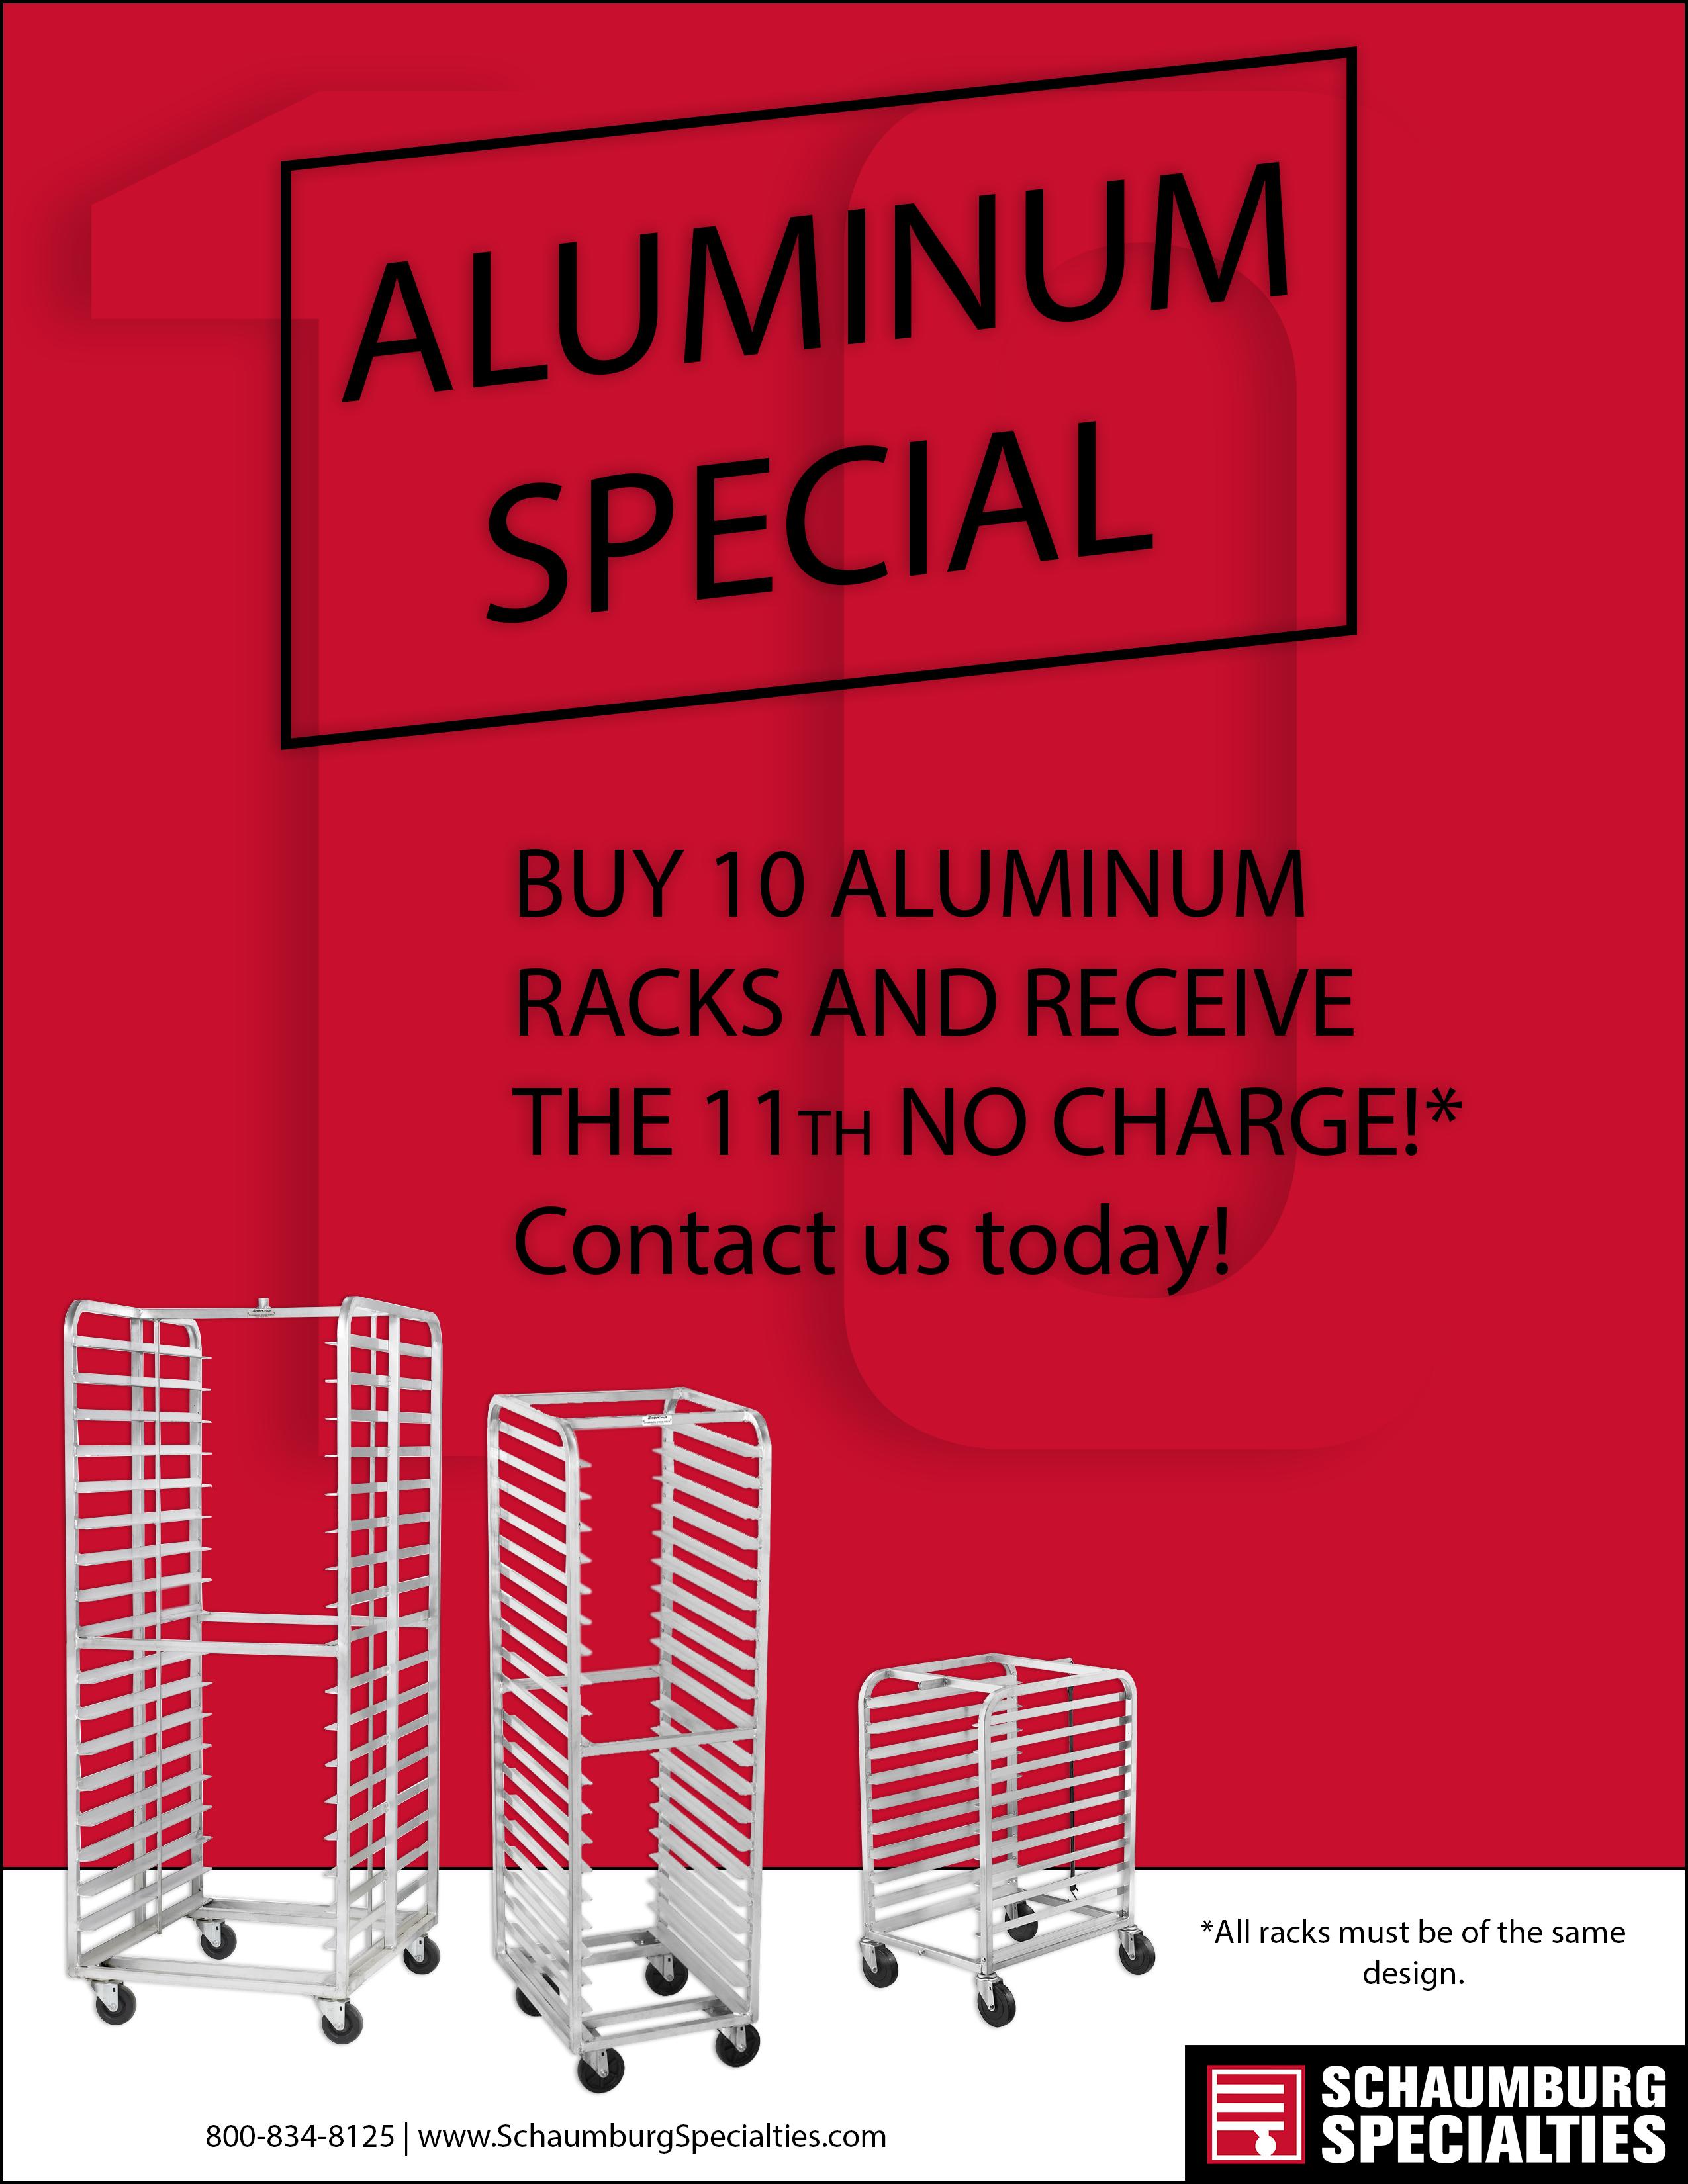 aluminum-special-campaign-2.png